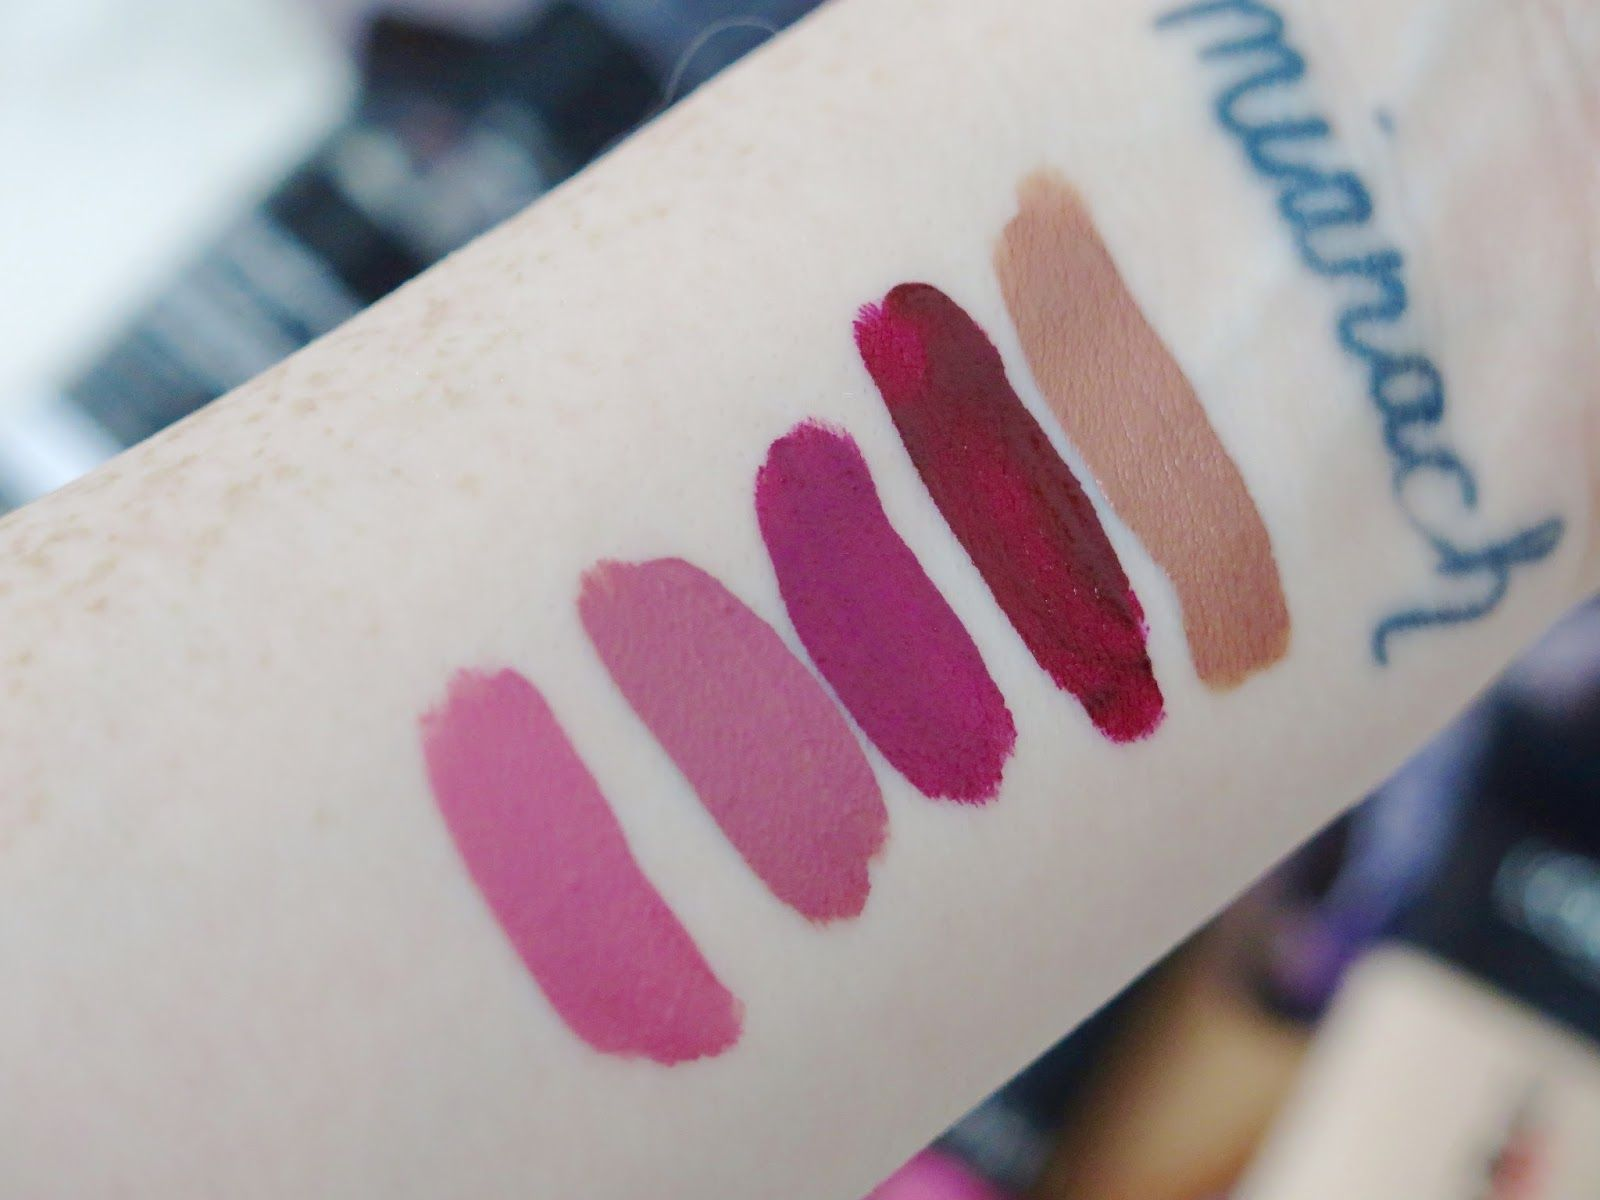 Everlasting Liquid Lipstick by KVD Vegan Beauty #21